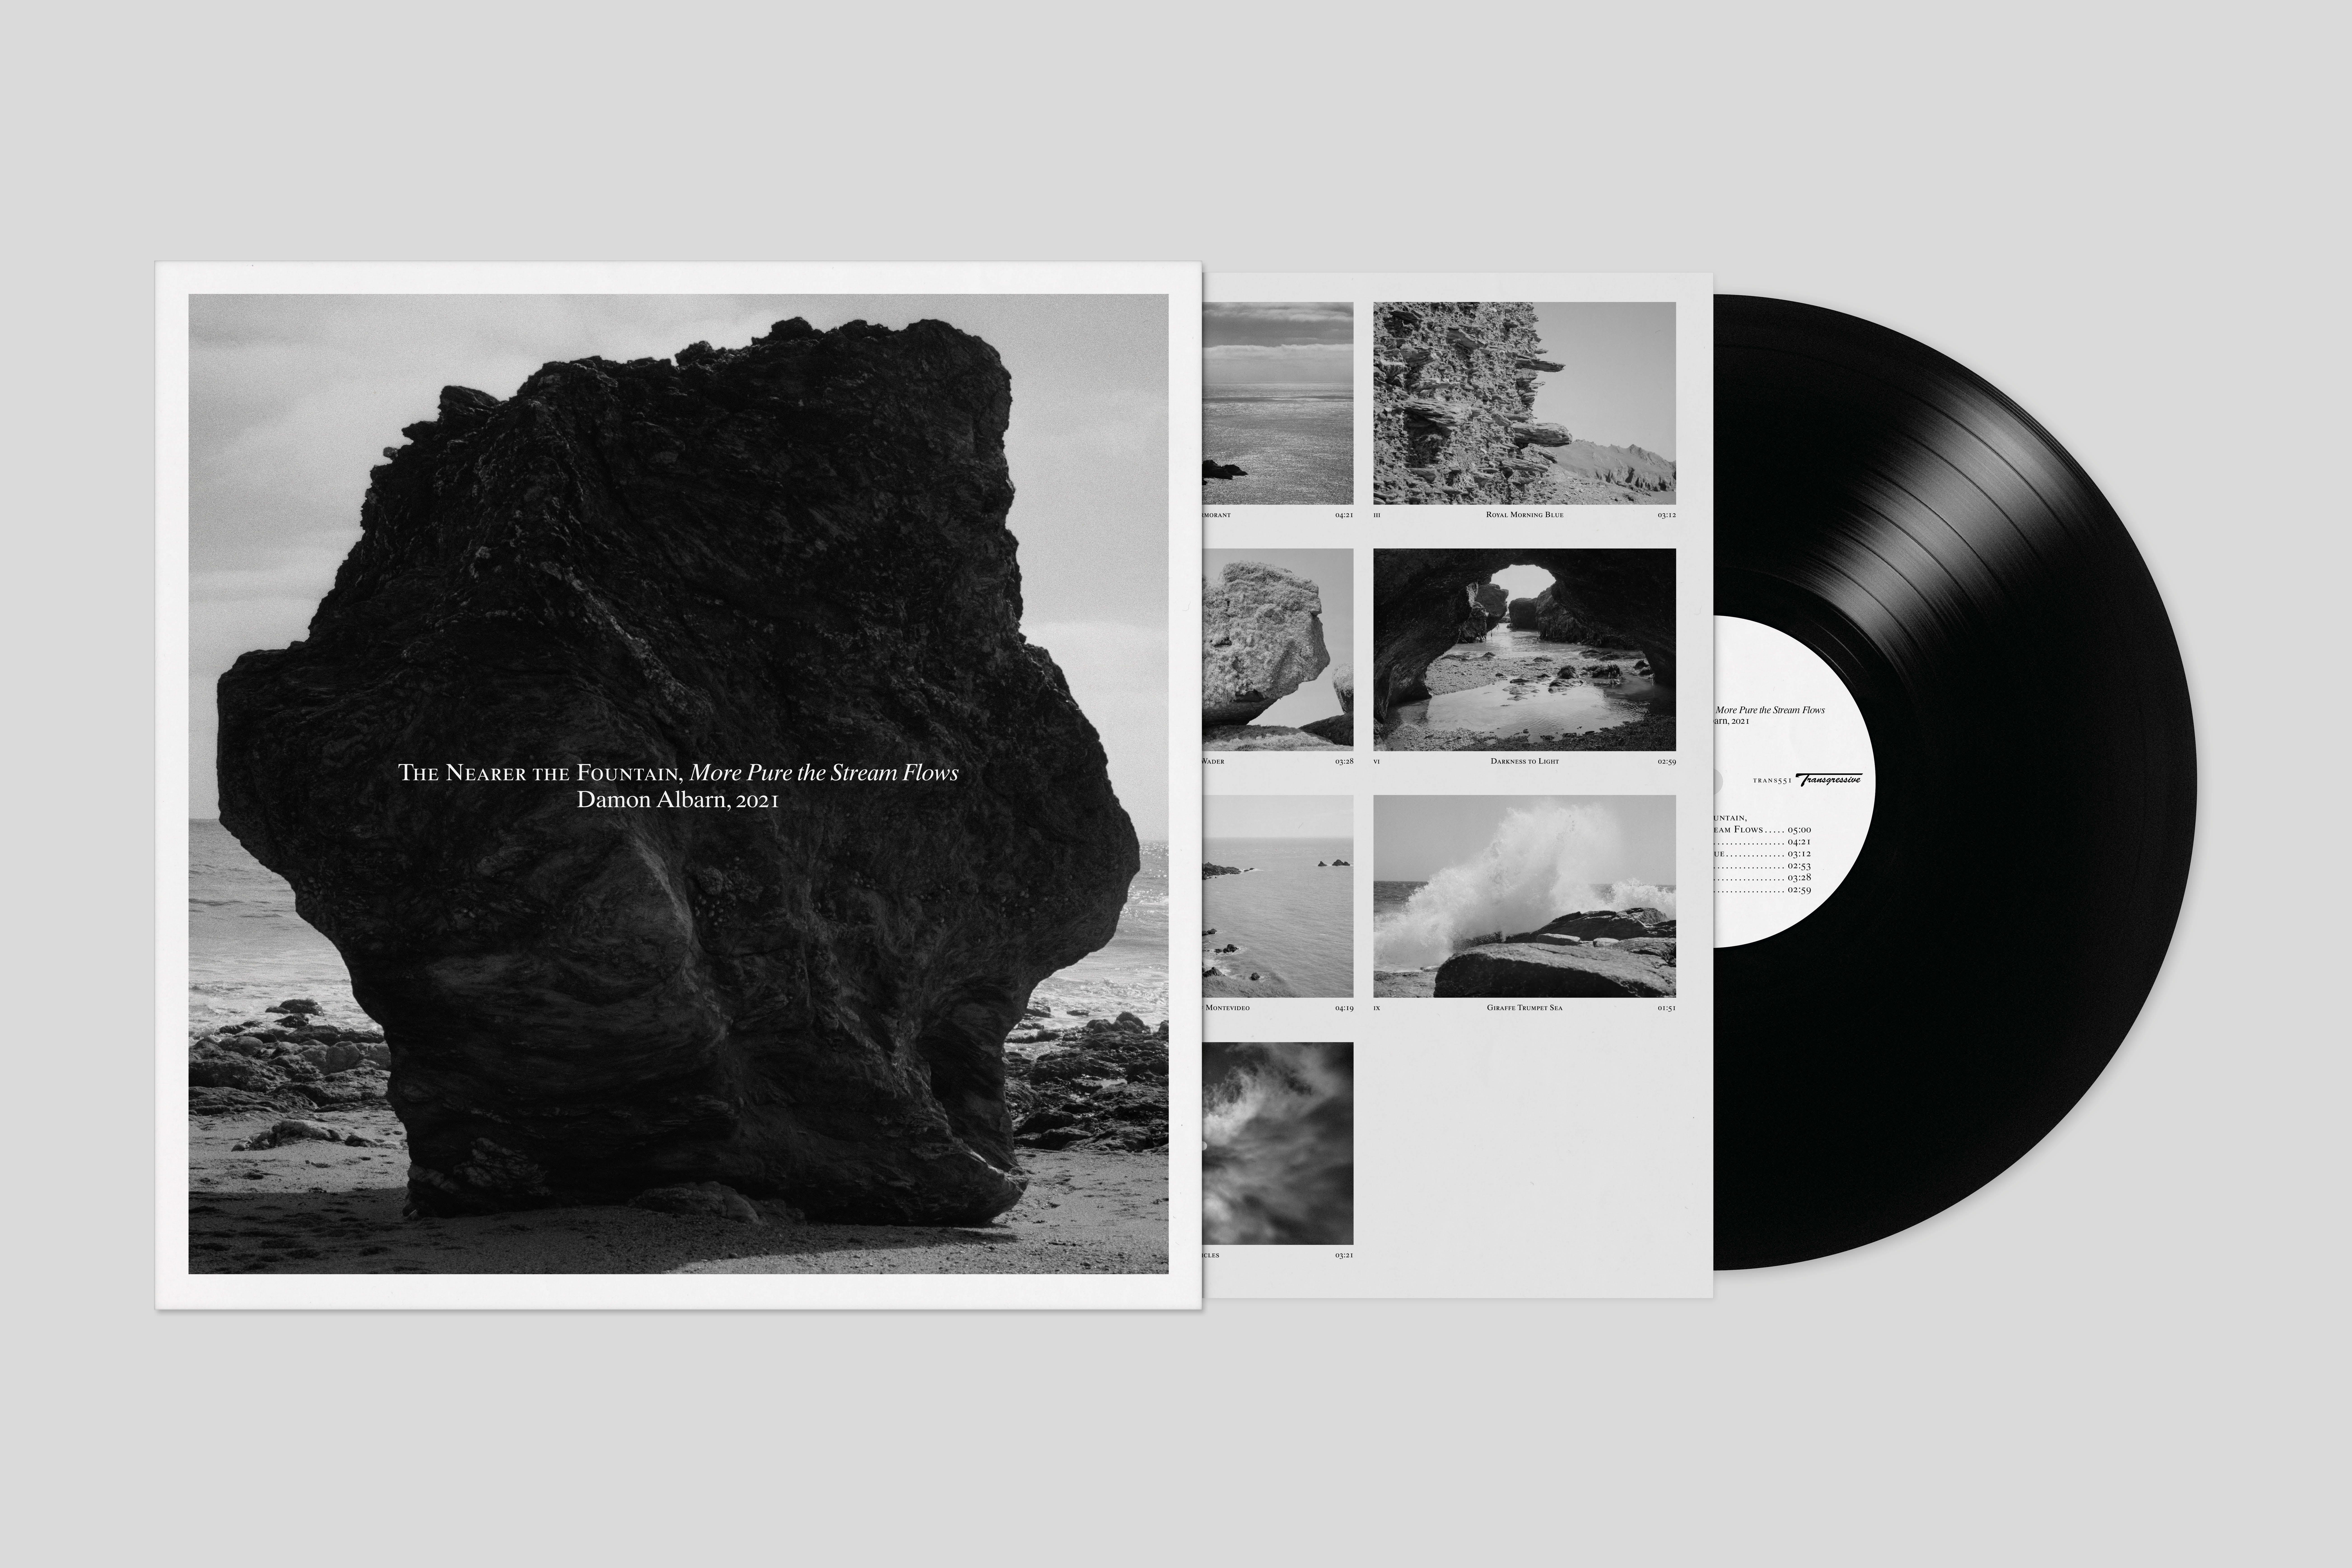 The Nearer The Fountain, More Pure The Stream Flows - LP - Damon Albarn